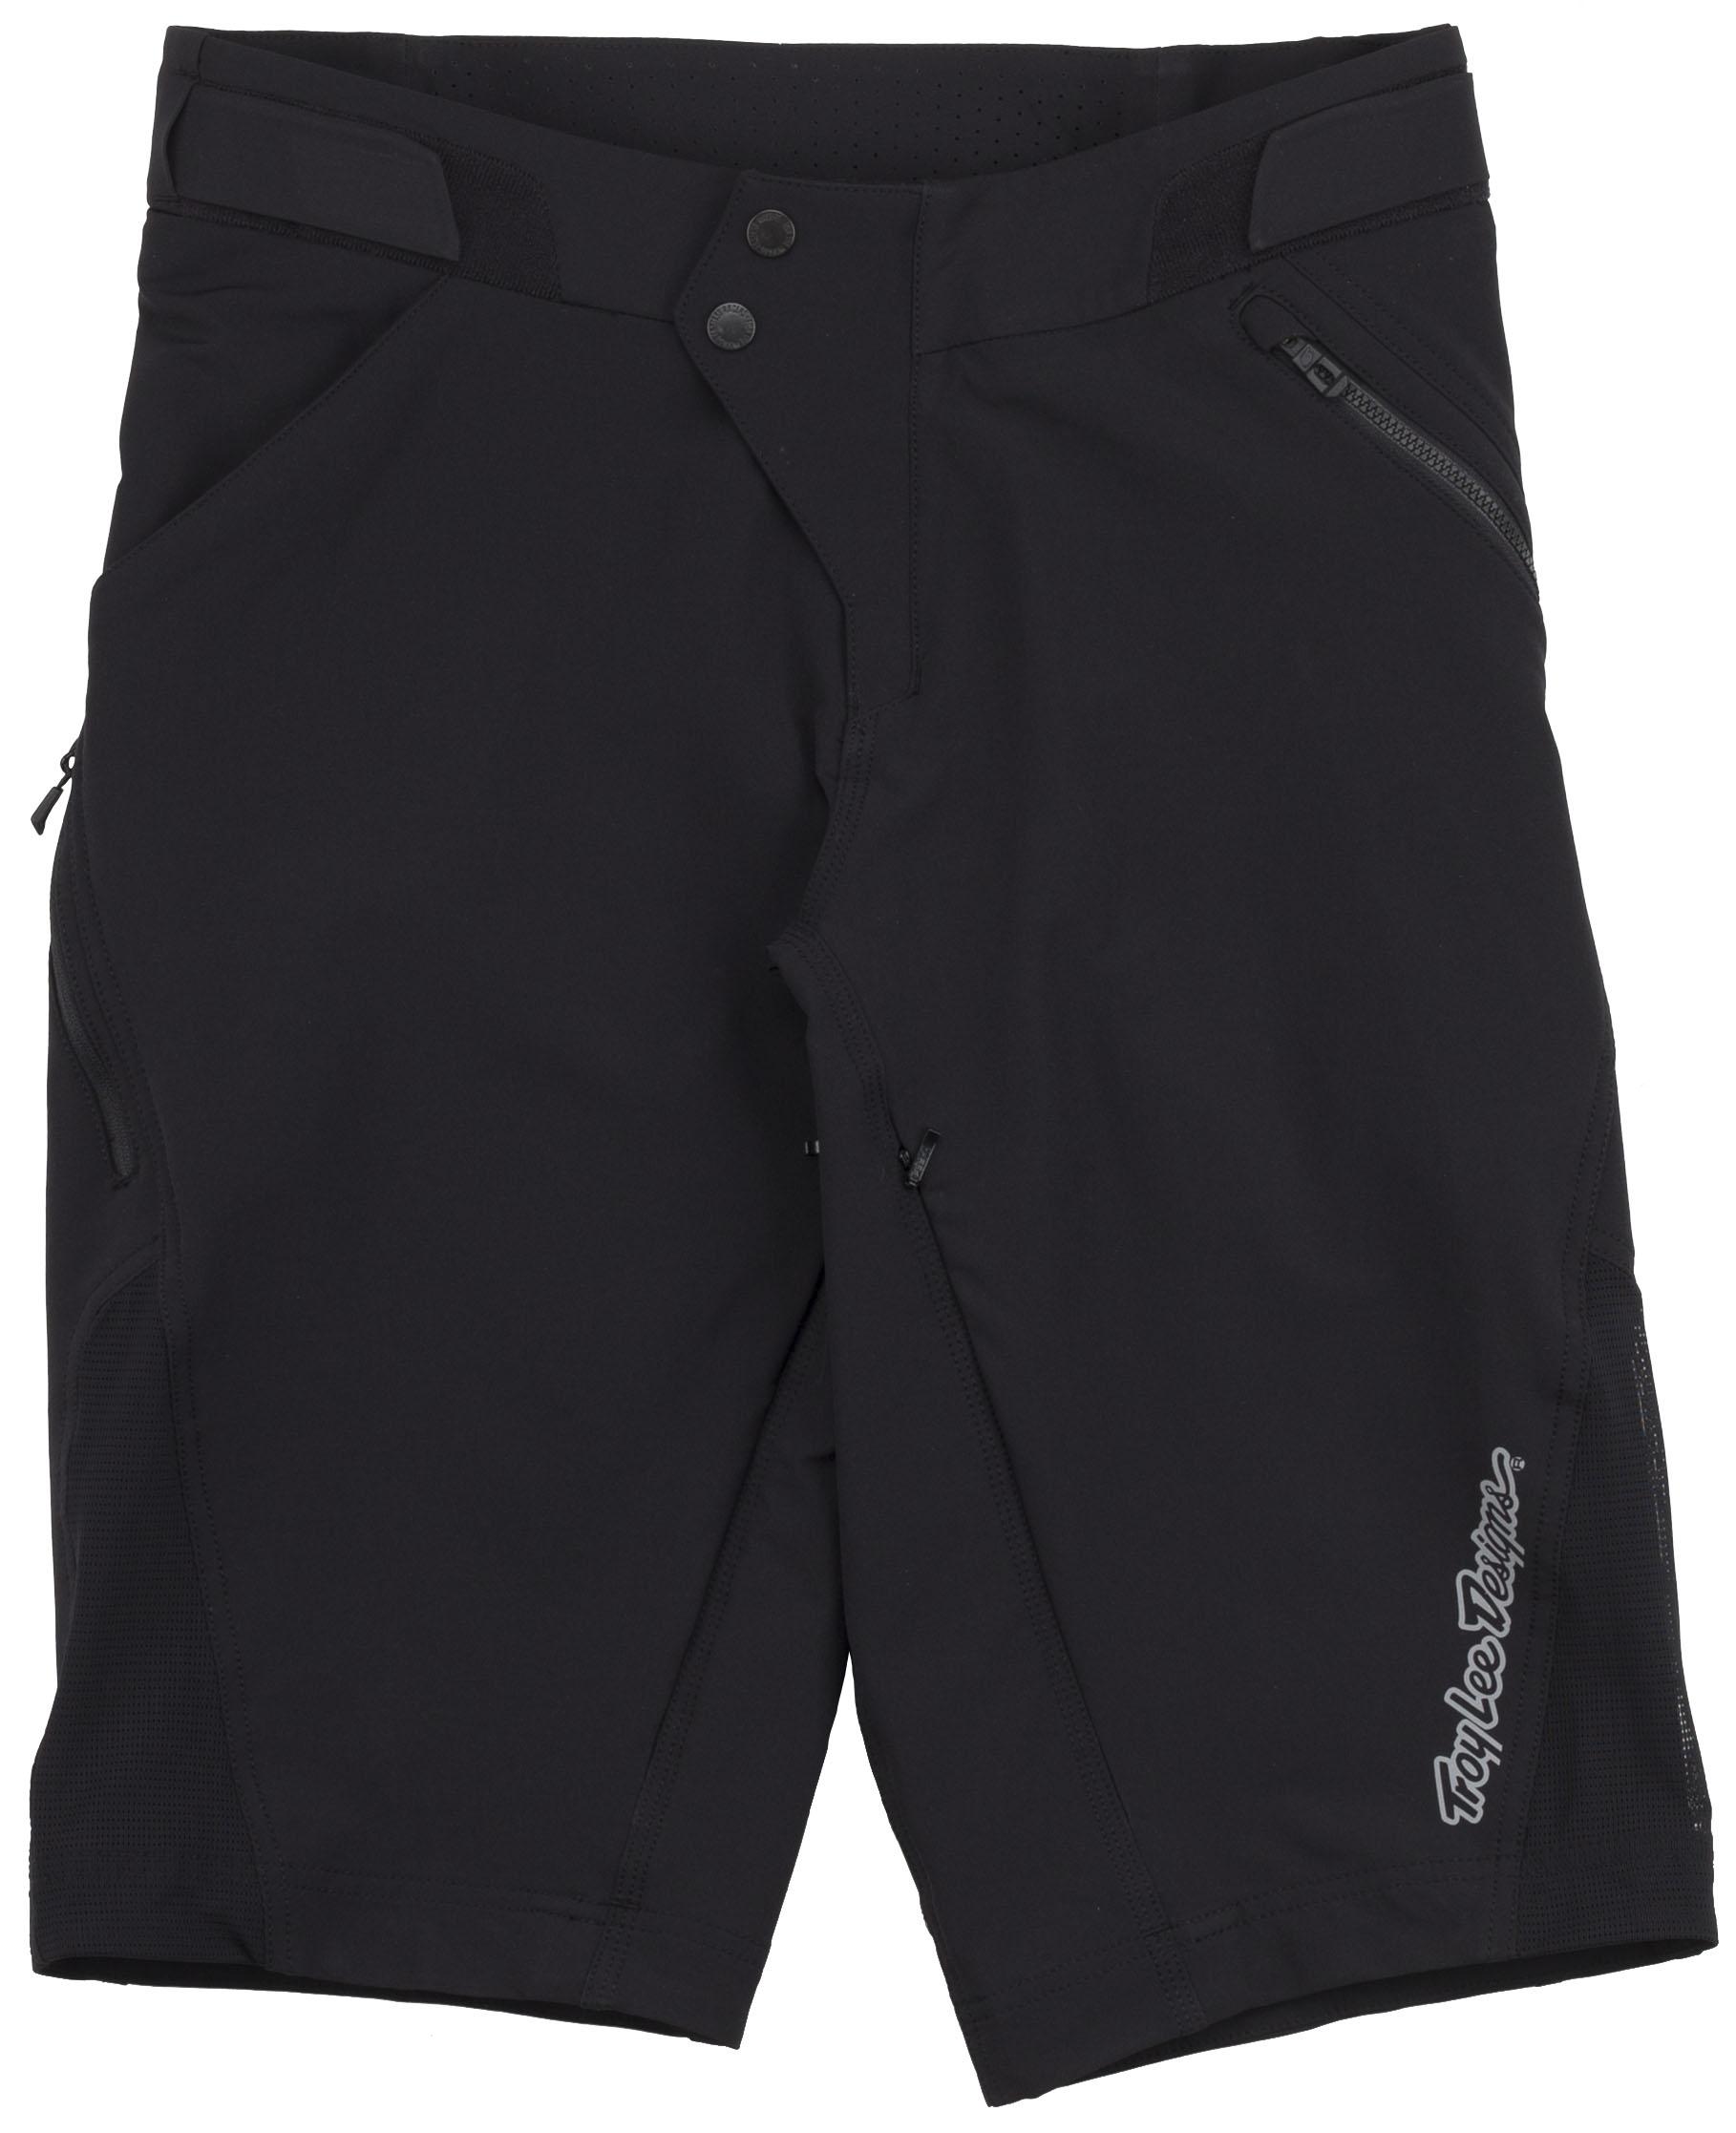 Troy Lee Designs Ruckus MTB Shorts Men's Size 38 in Black